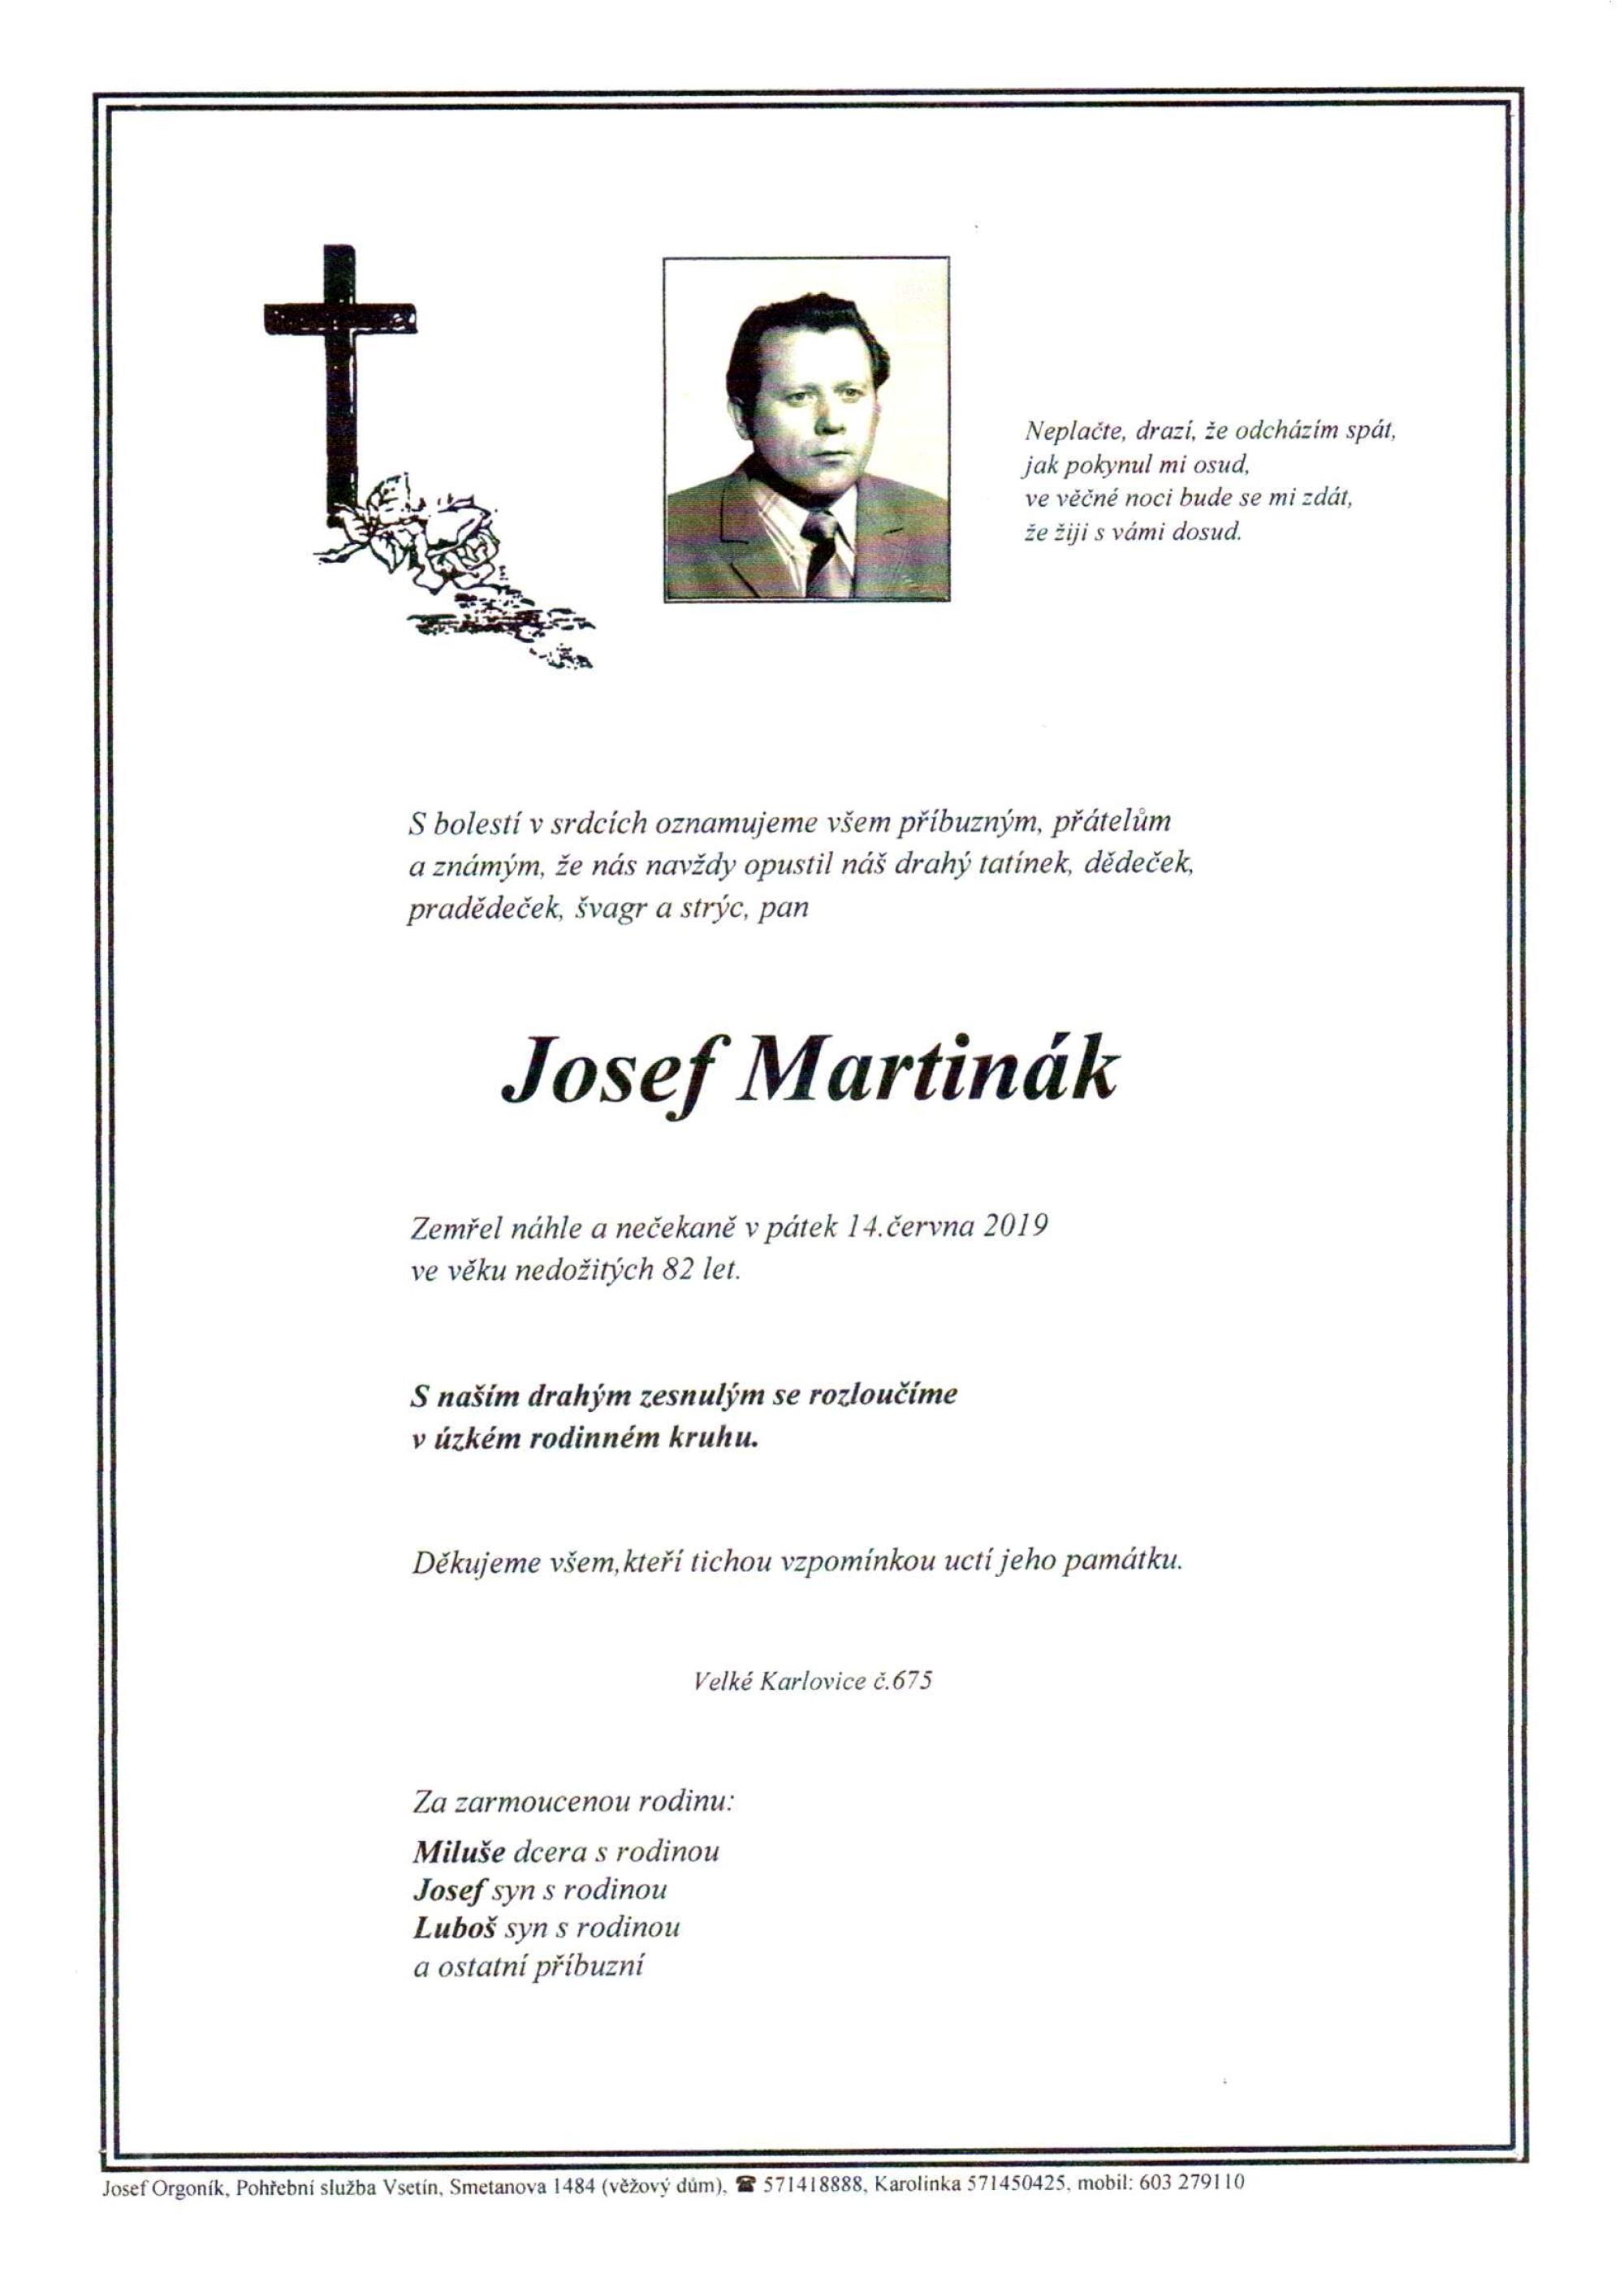 Josef Martinák